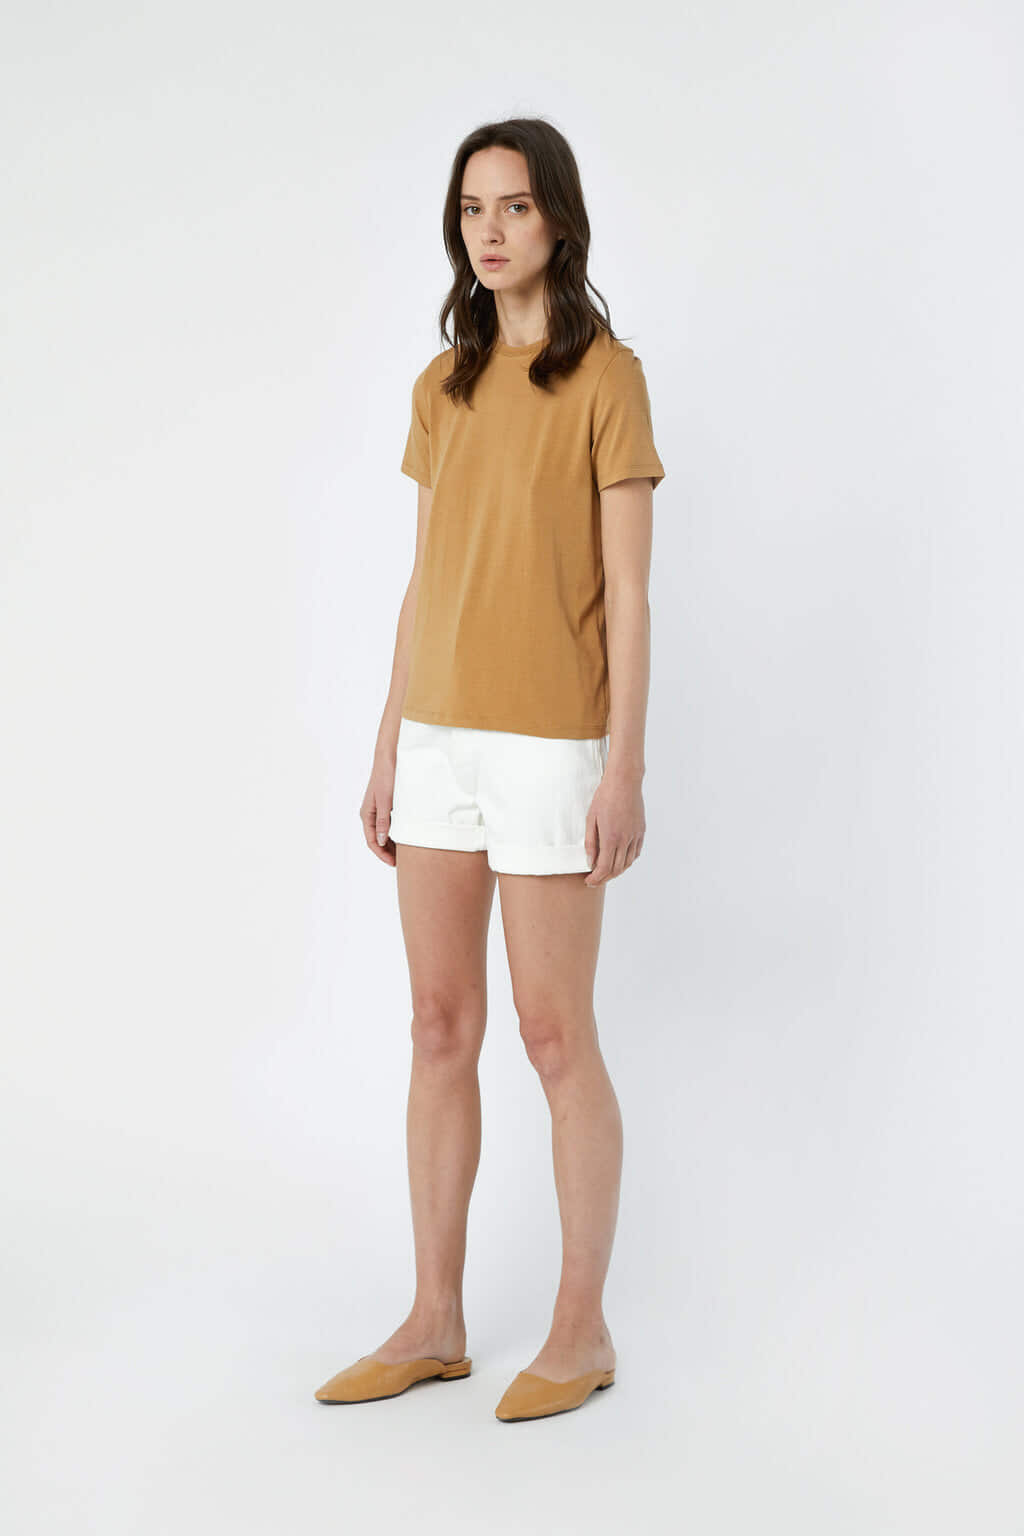 TShirt 3343 Camel 2